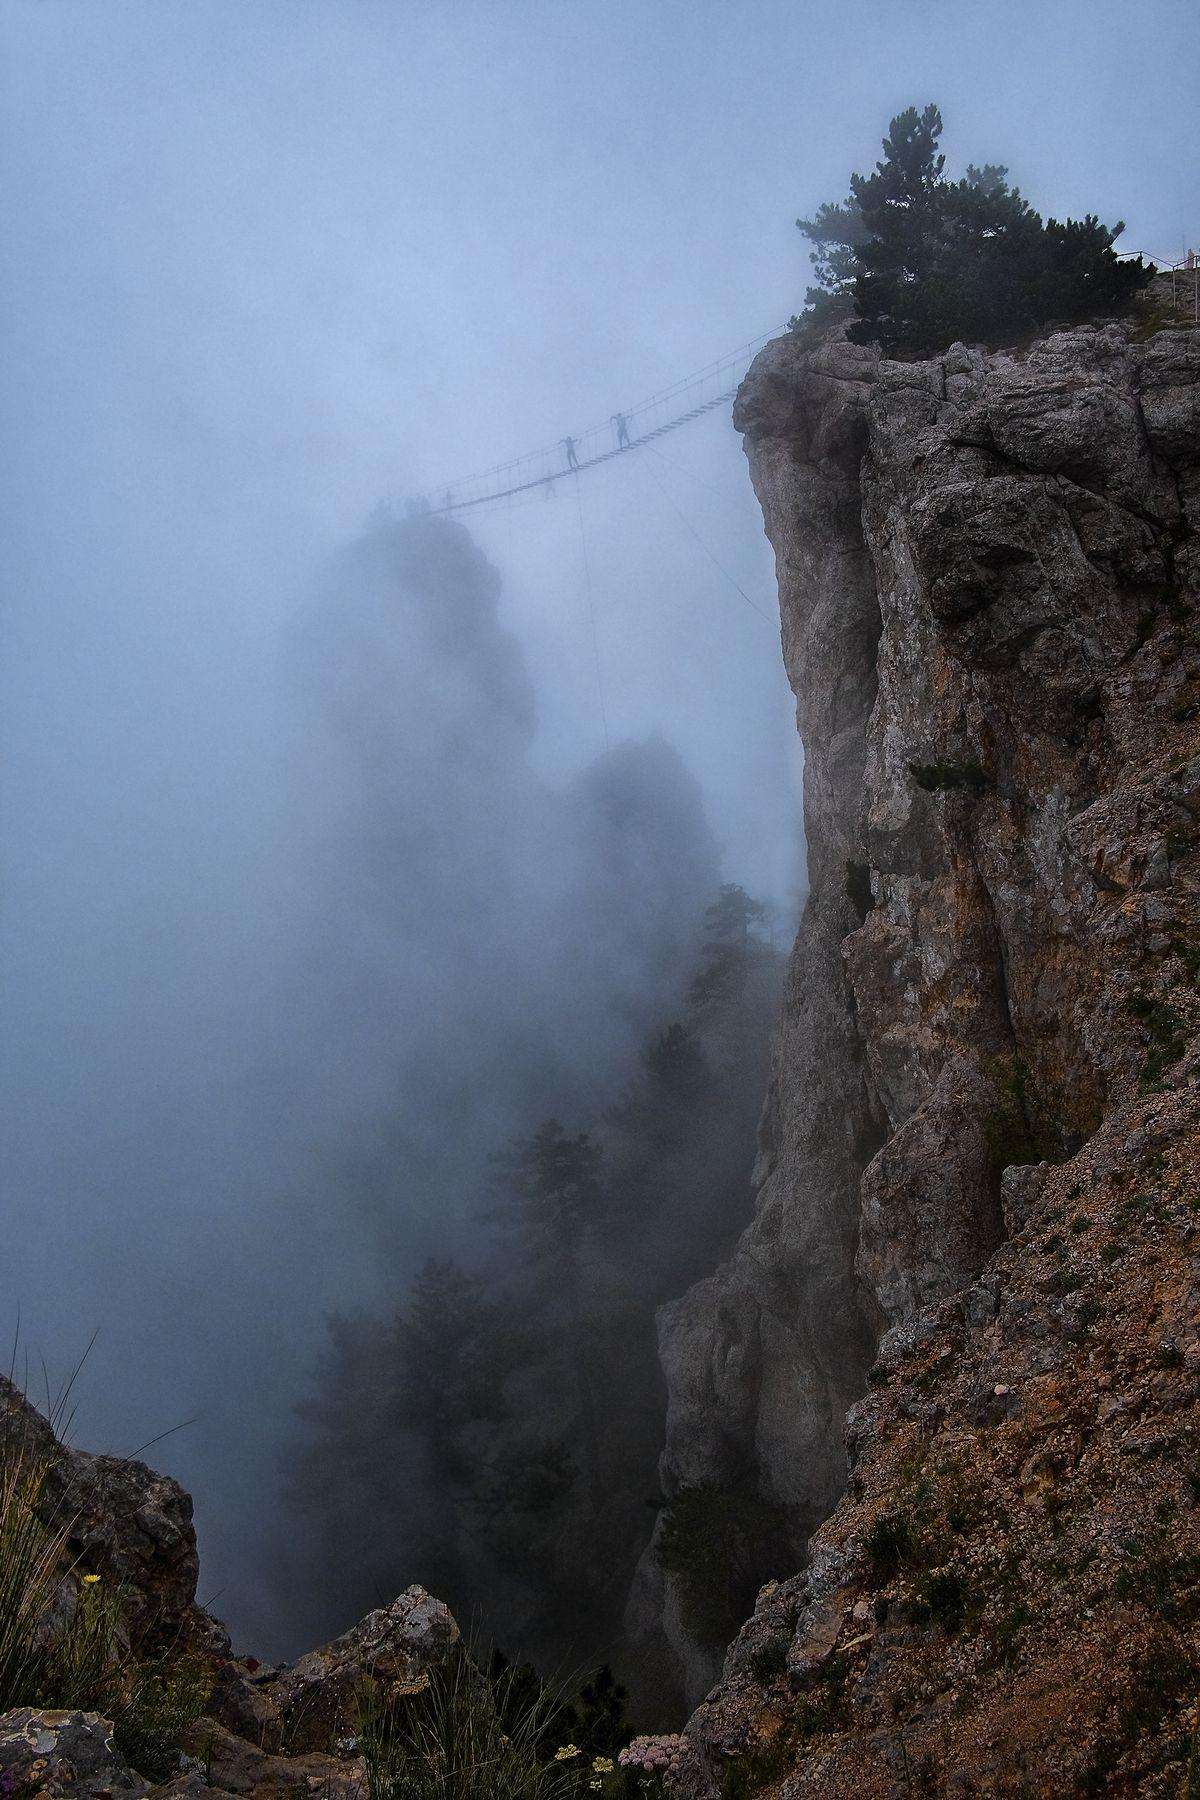 Лестница в небо (Stairway to heaven - по мотивам Led Zeppelin) скалы силуэты людей туман пропасть